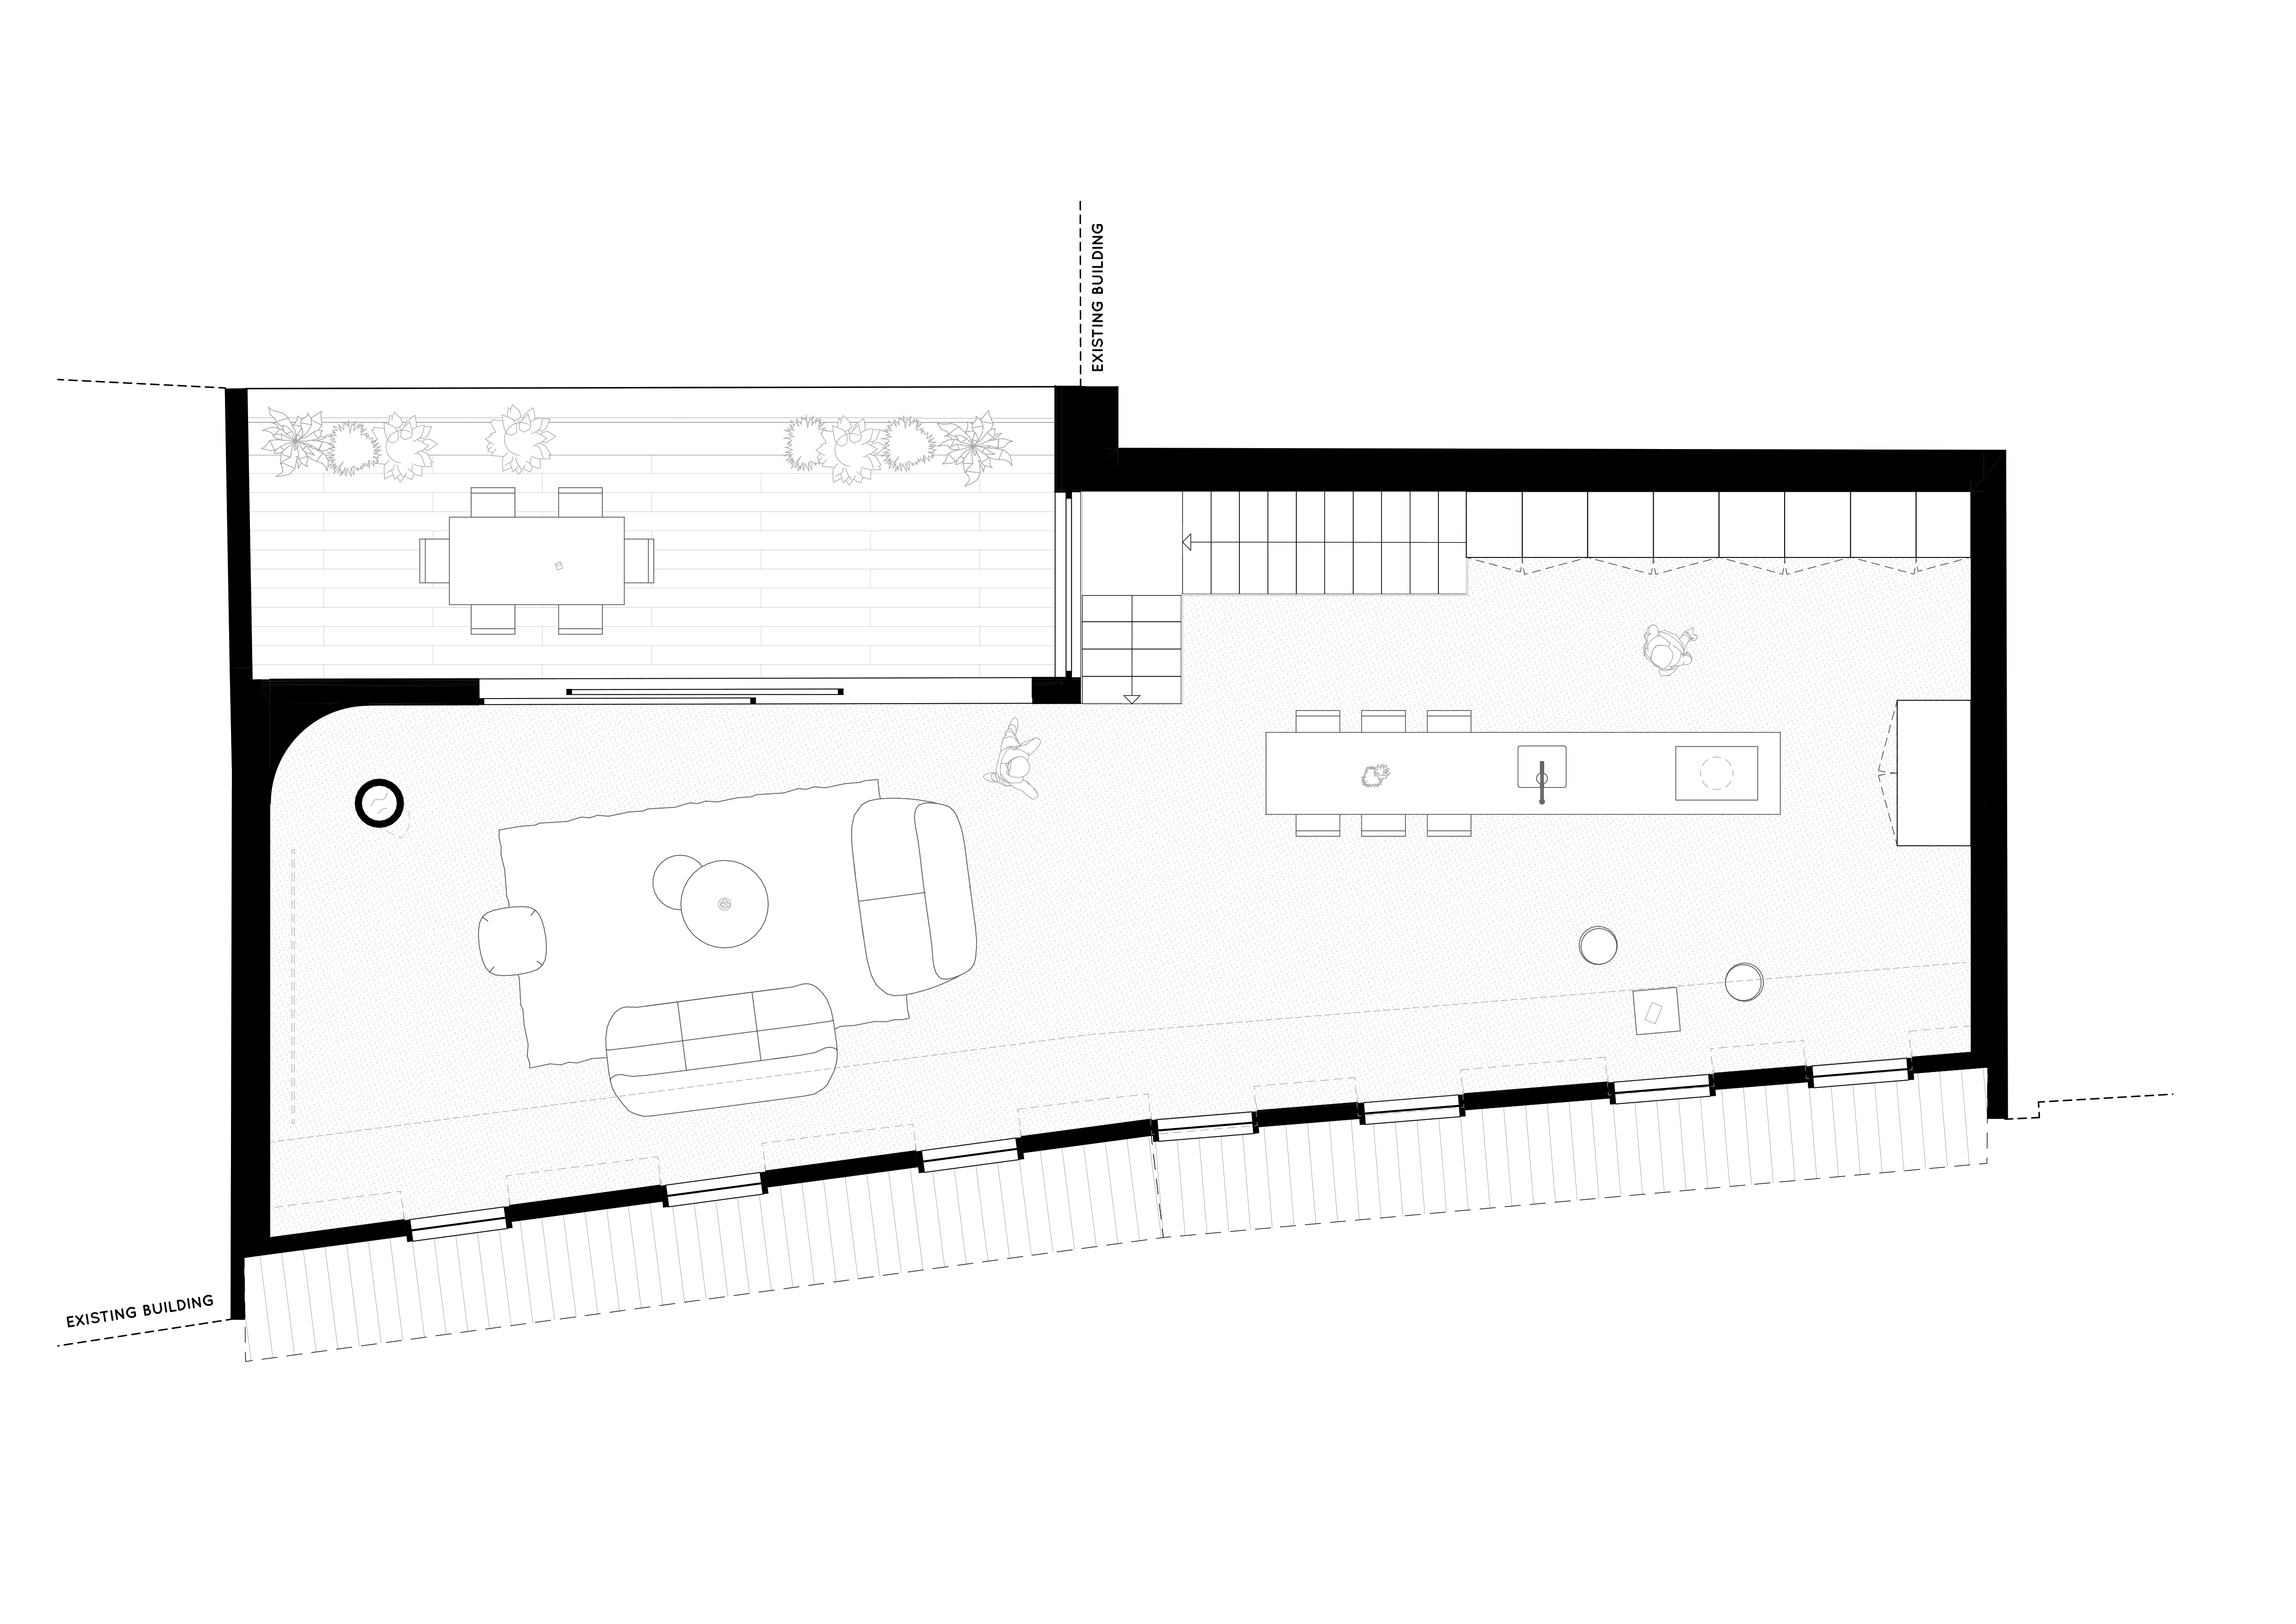 Plan duplex haut ok1